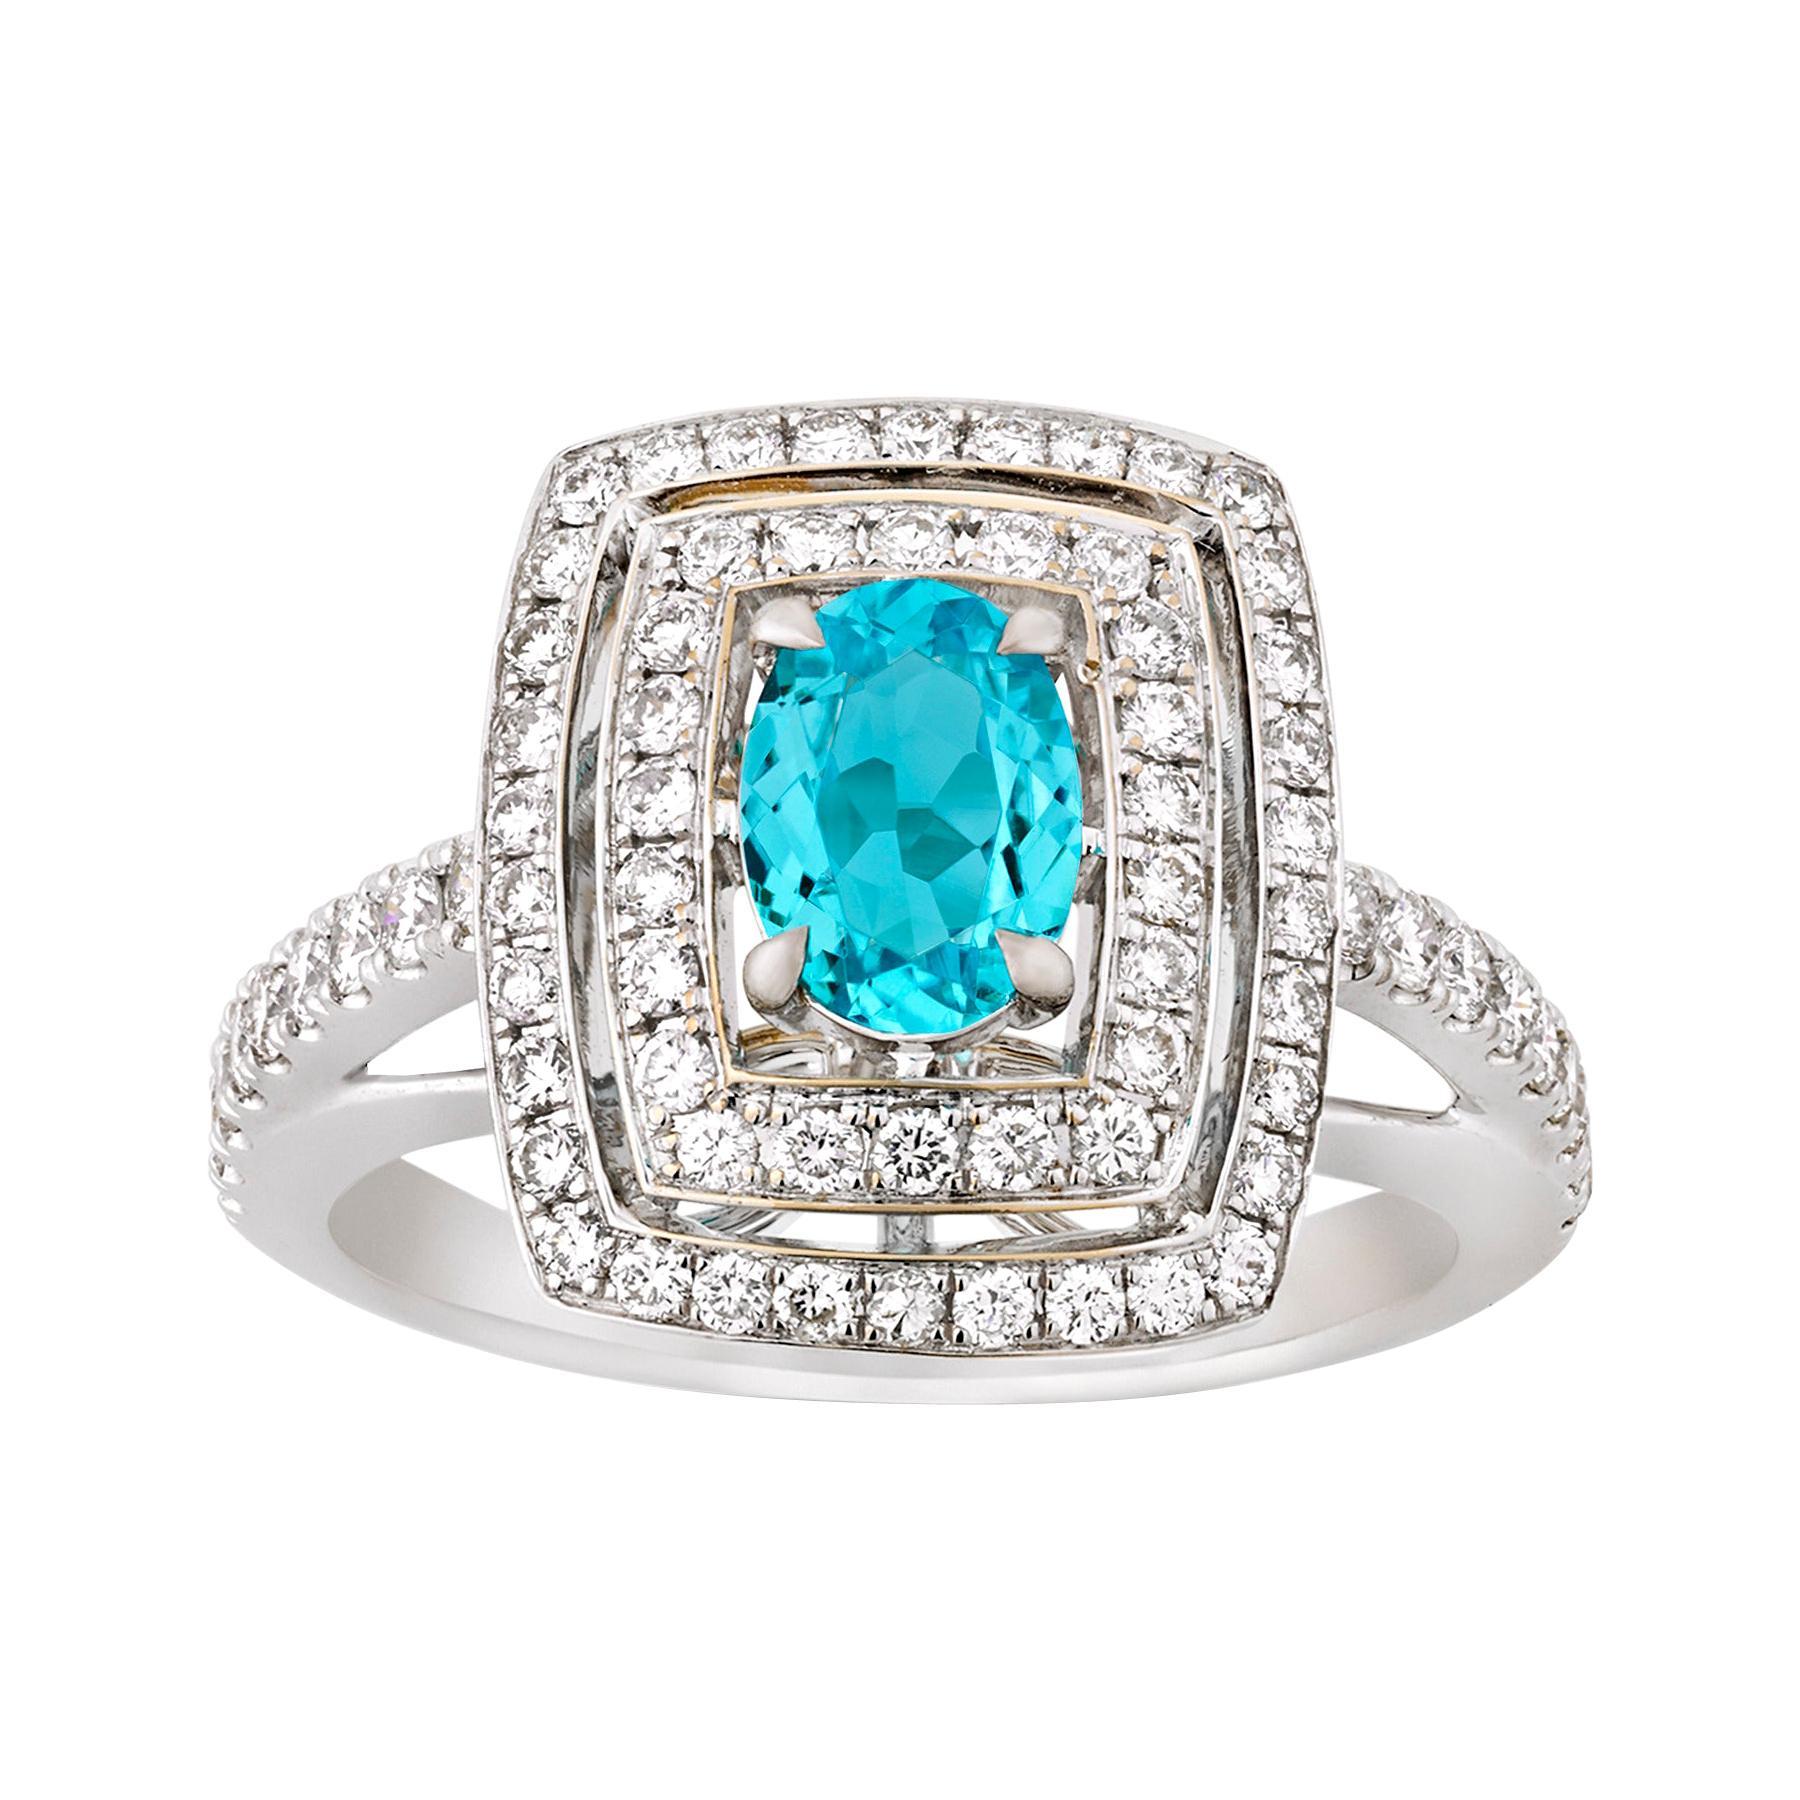 Brazilian Paraiba Tourmaline and Diamond Ring